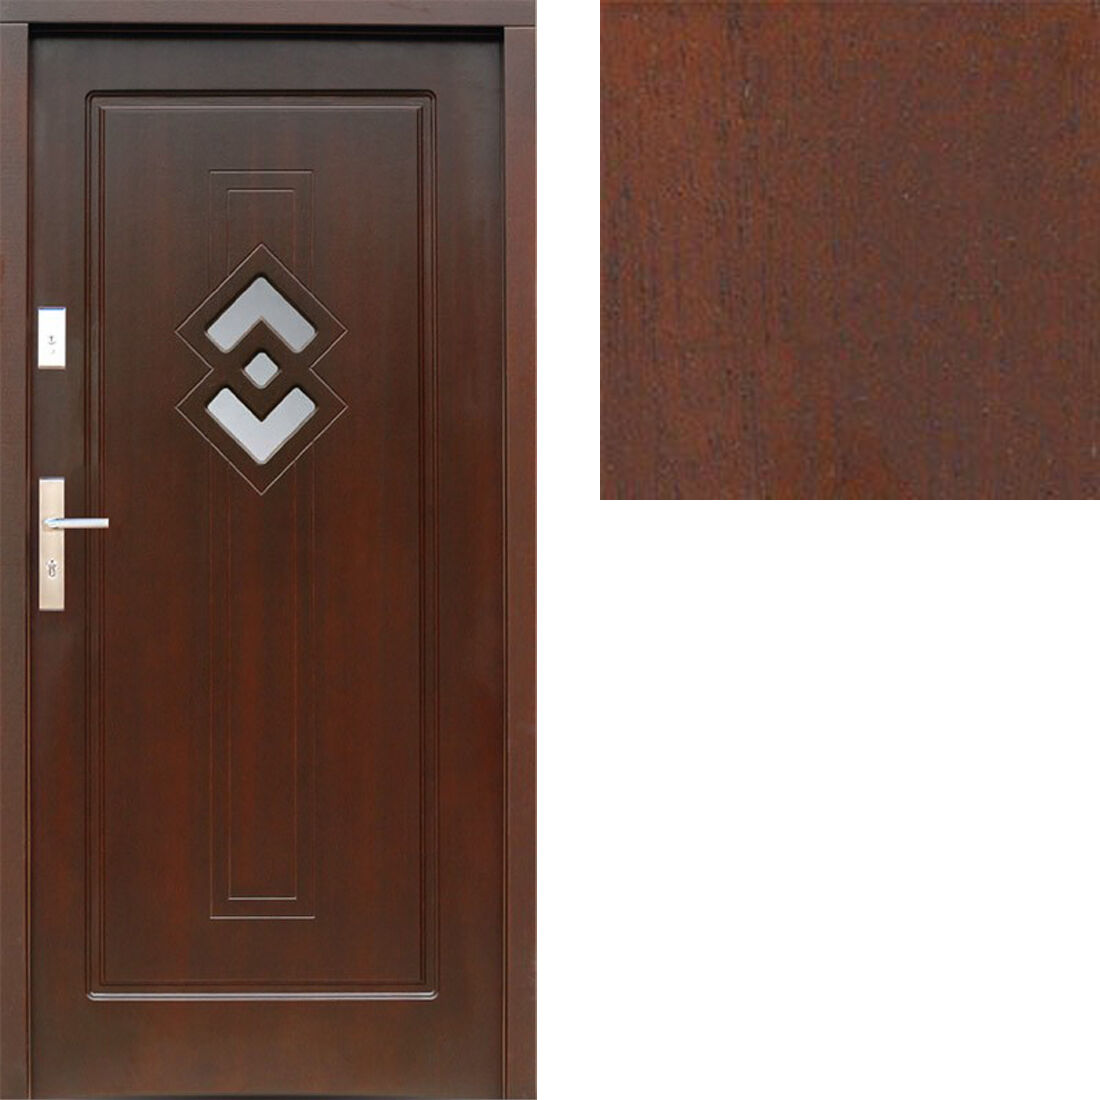 Holzaußentür hrejtie porte porte porte porte porte d'entrée türplatte holtztür 80-100 7 couleurs 0d5b97